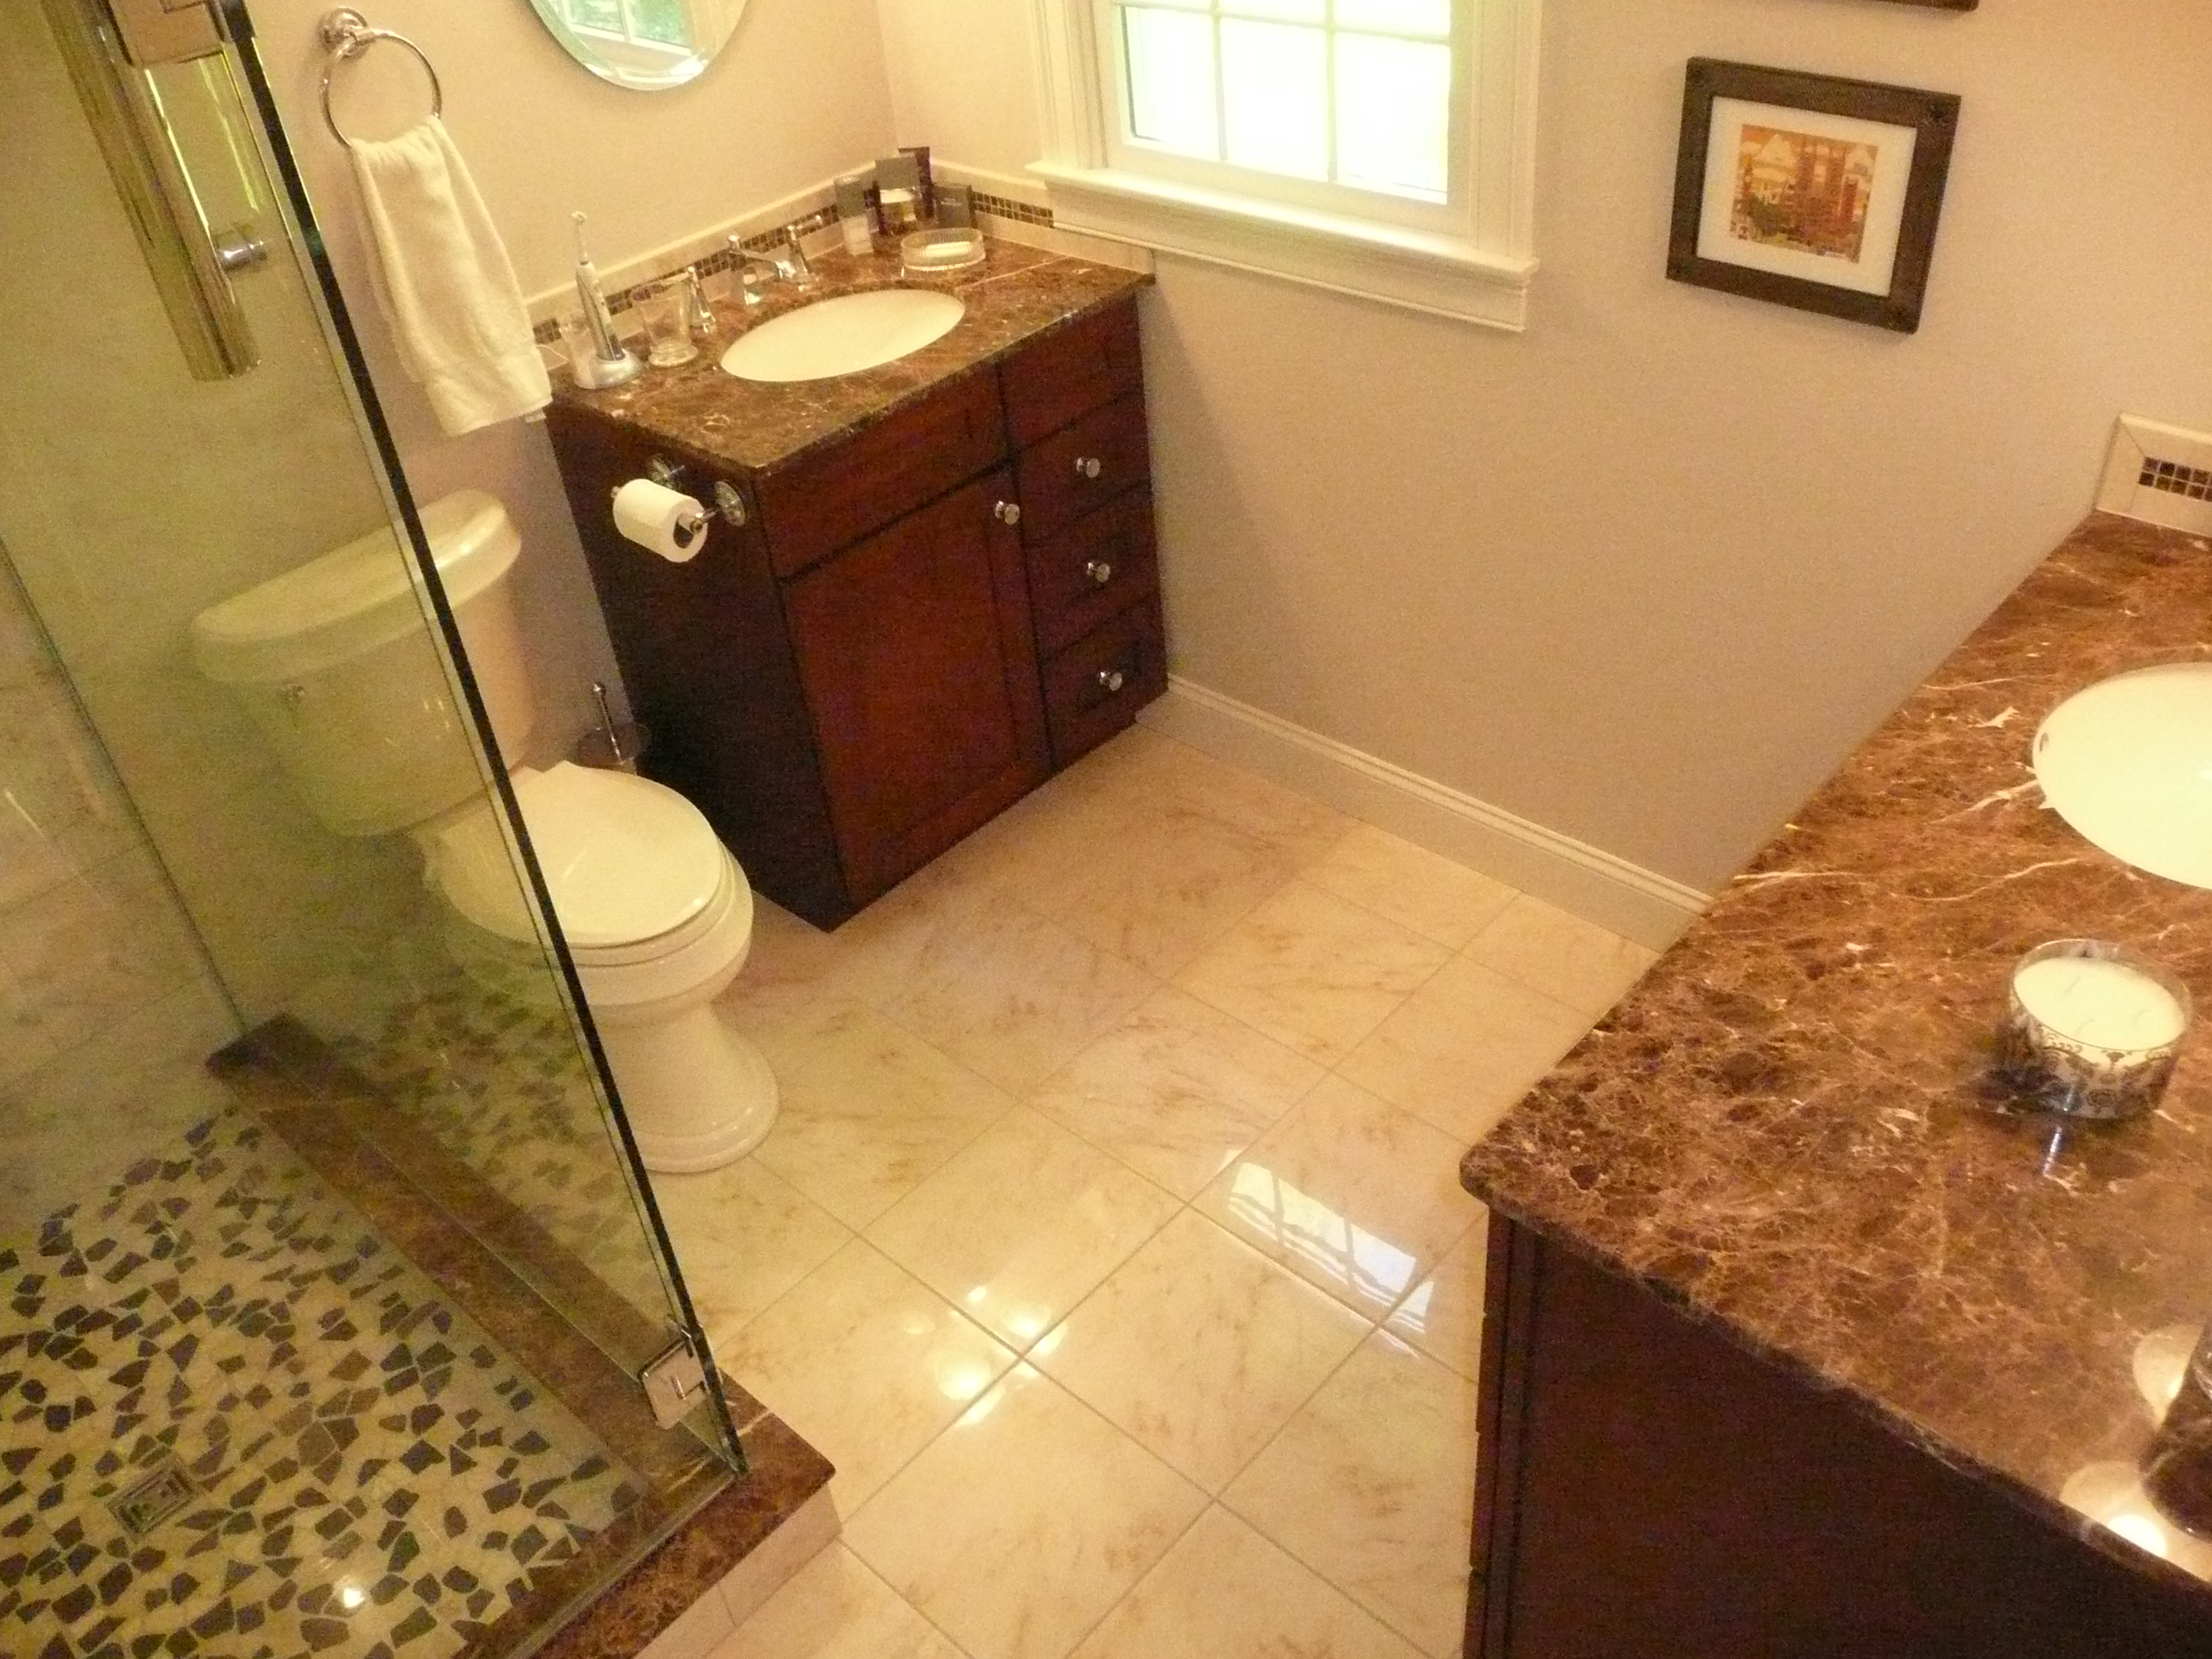 Bathroom Remodel Nh bathrooms – nh kitchen design, bathroom remodeling | pitt pro home